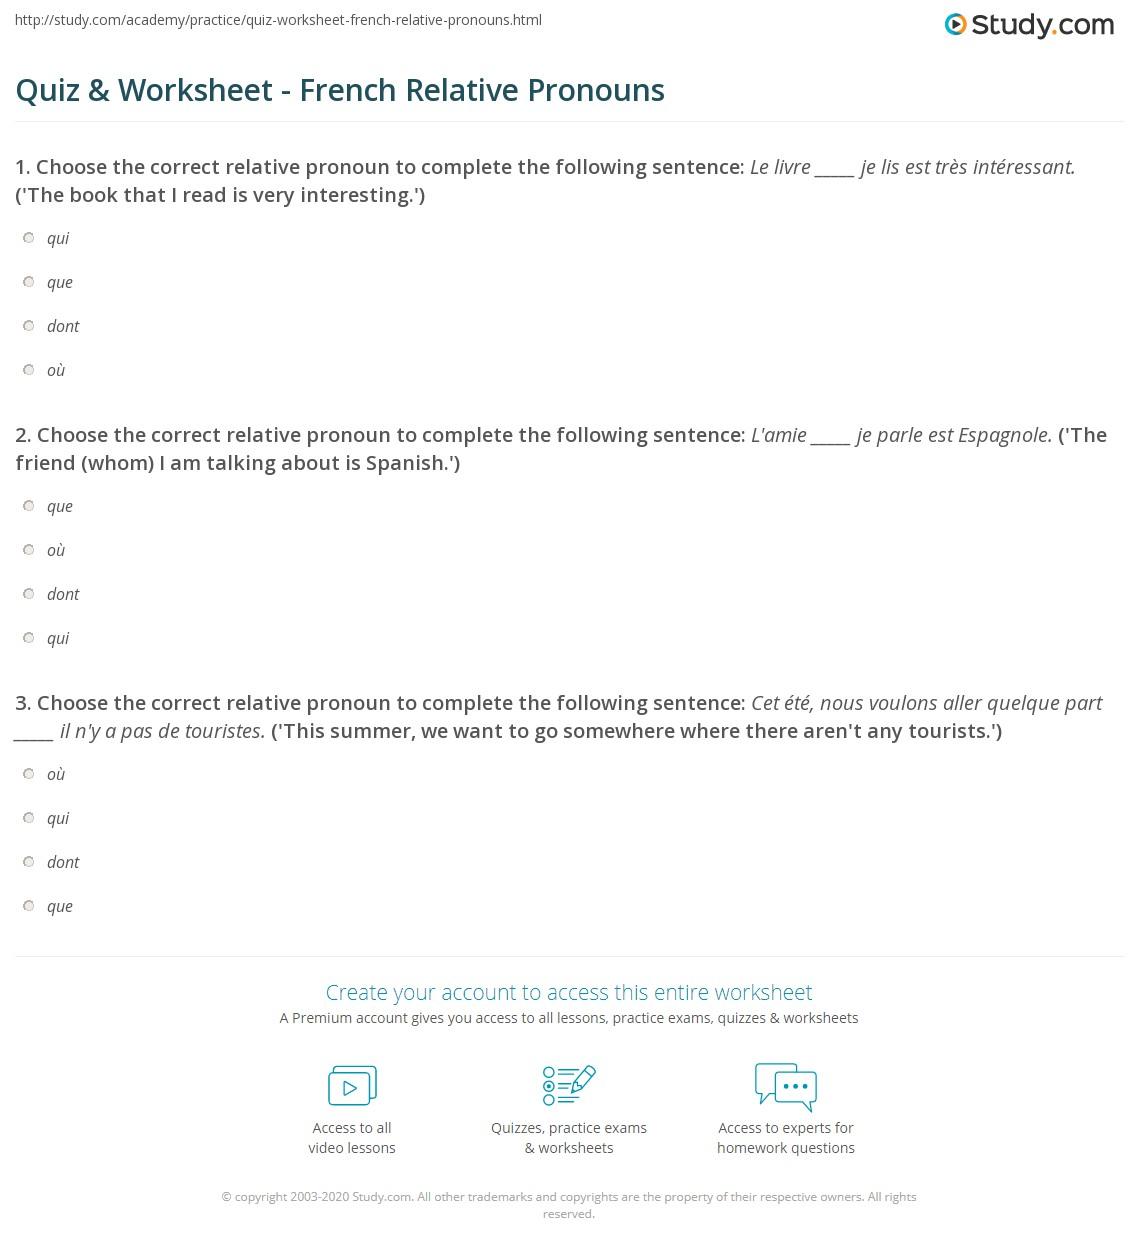 quiz worksheet french relative pronouns. Black Bedroom Furniture Sets. Home Design Ideas